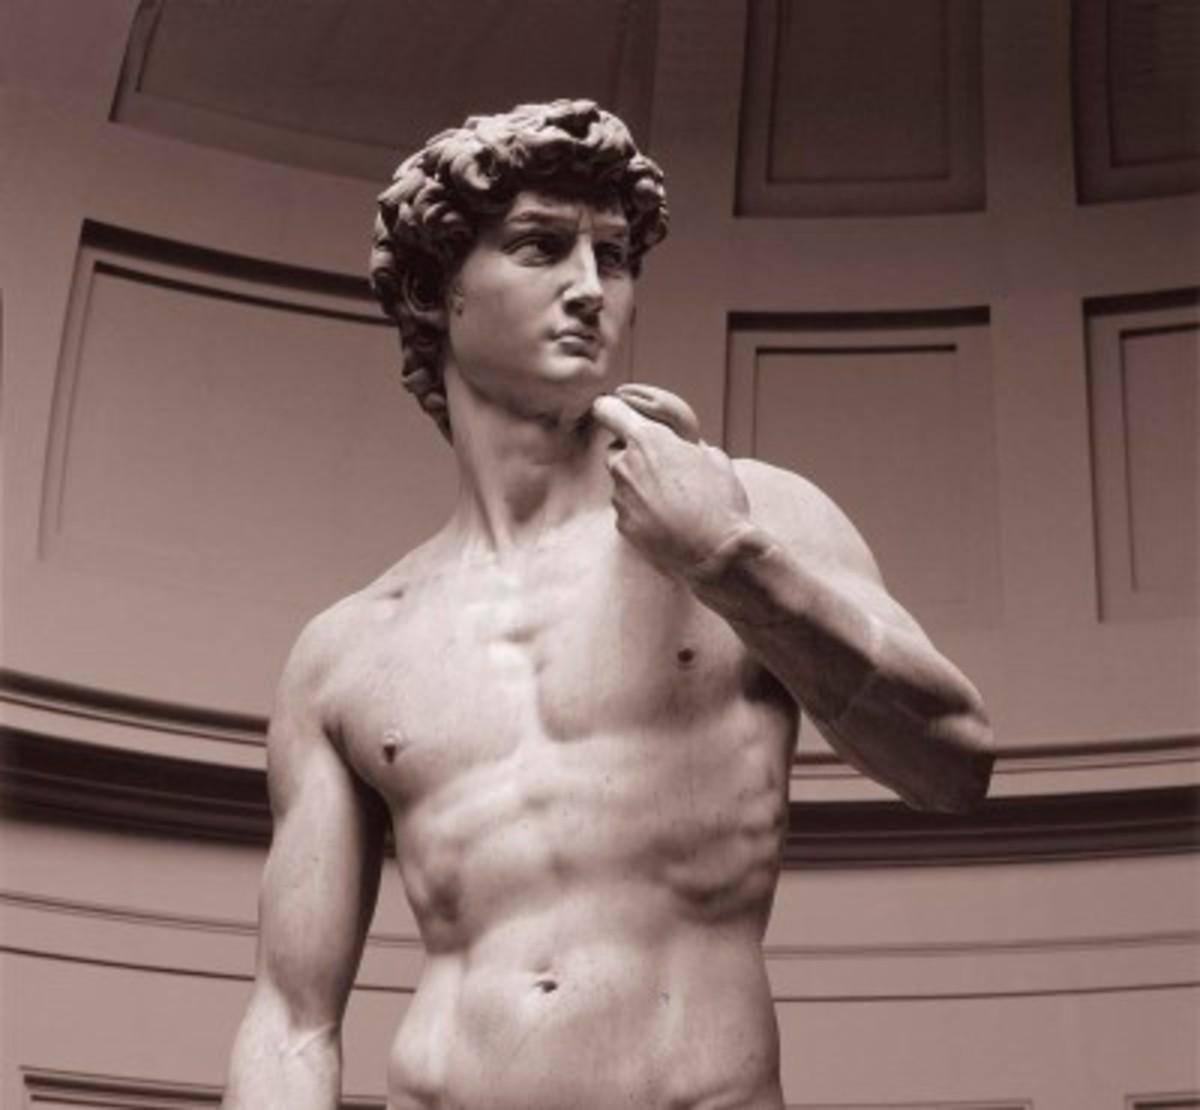 Michelangelo's David; Realist or Objectivist art?